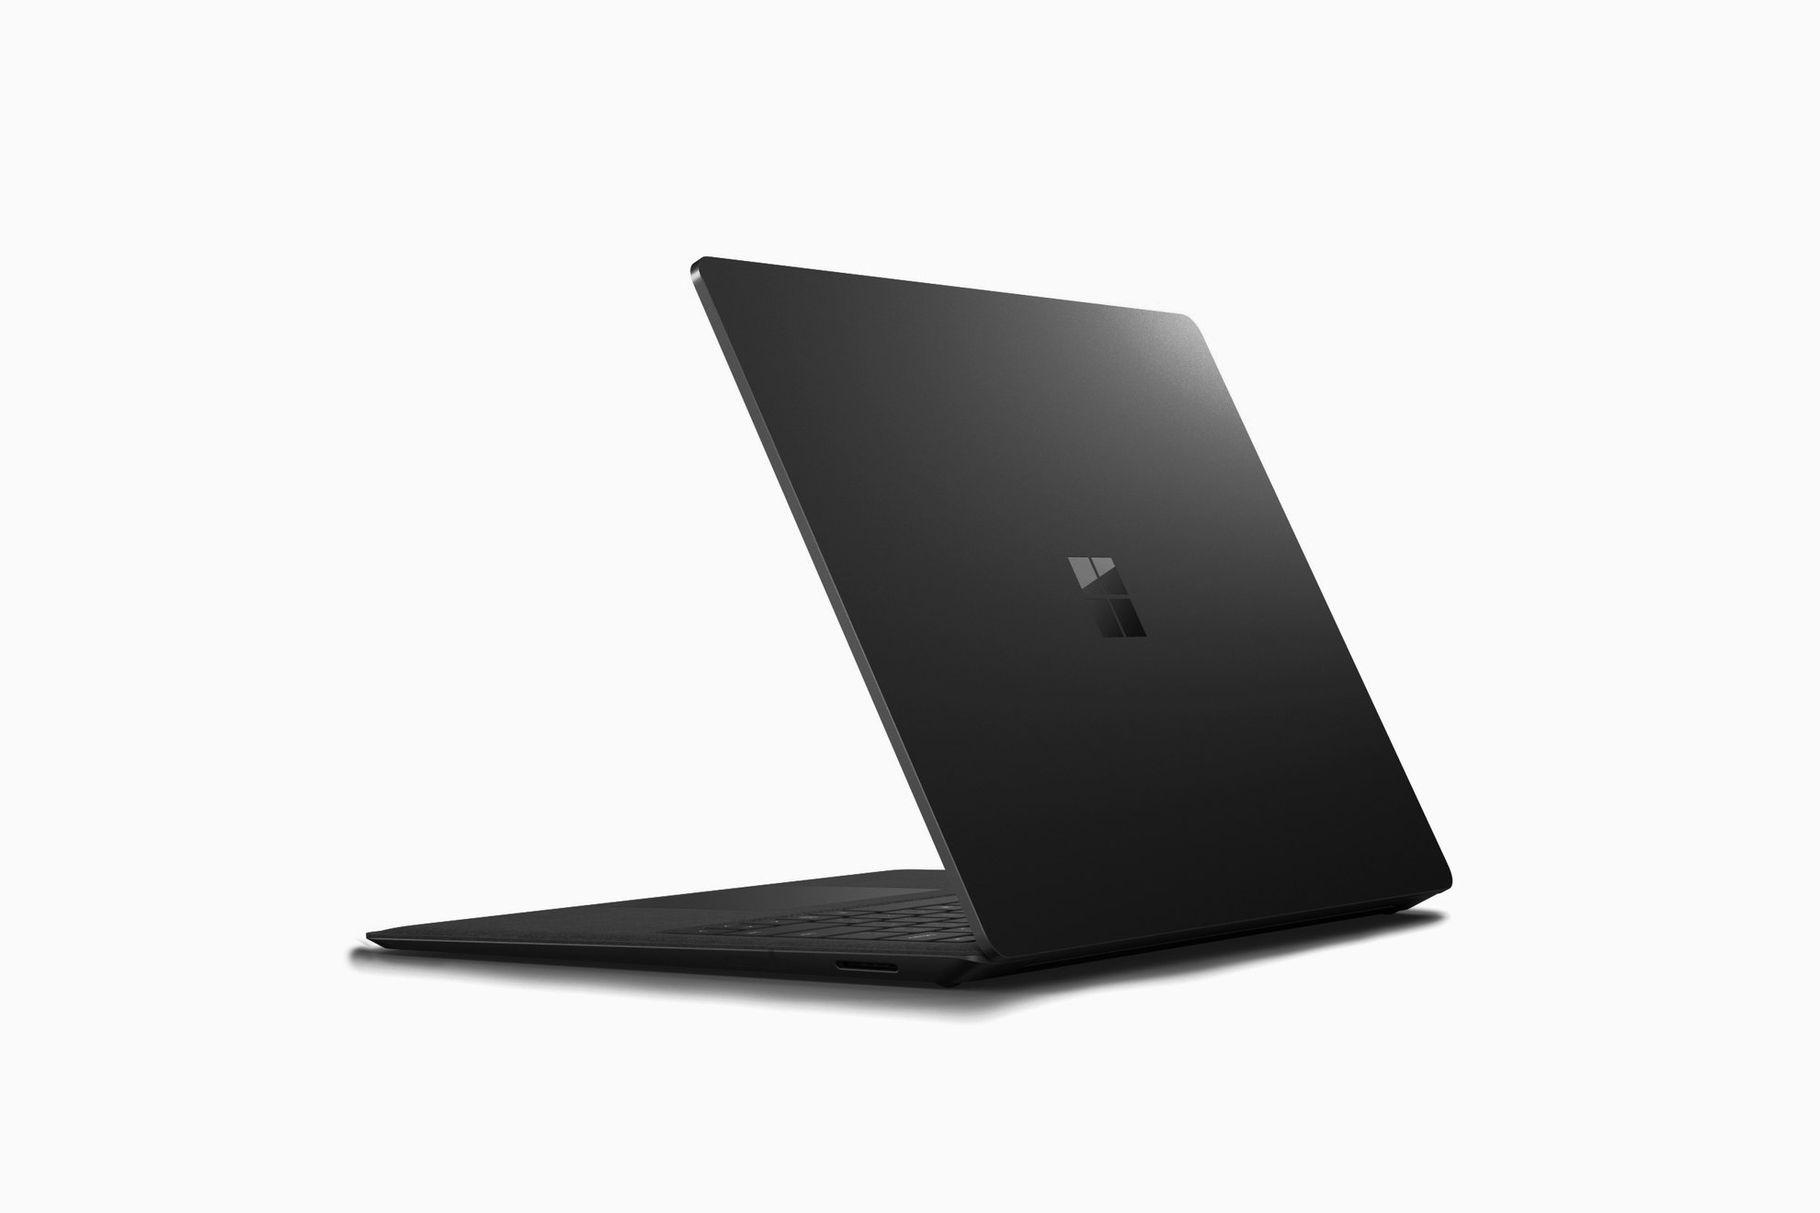 Image Result For Gaming Laptop Benchmarks